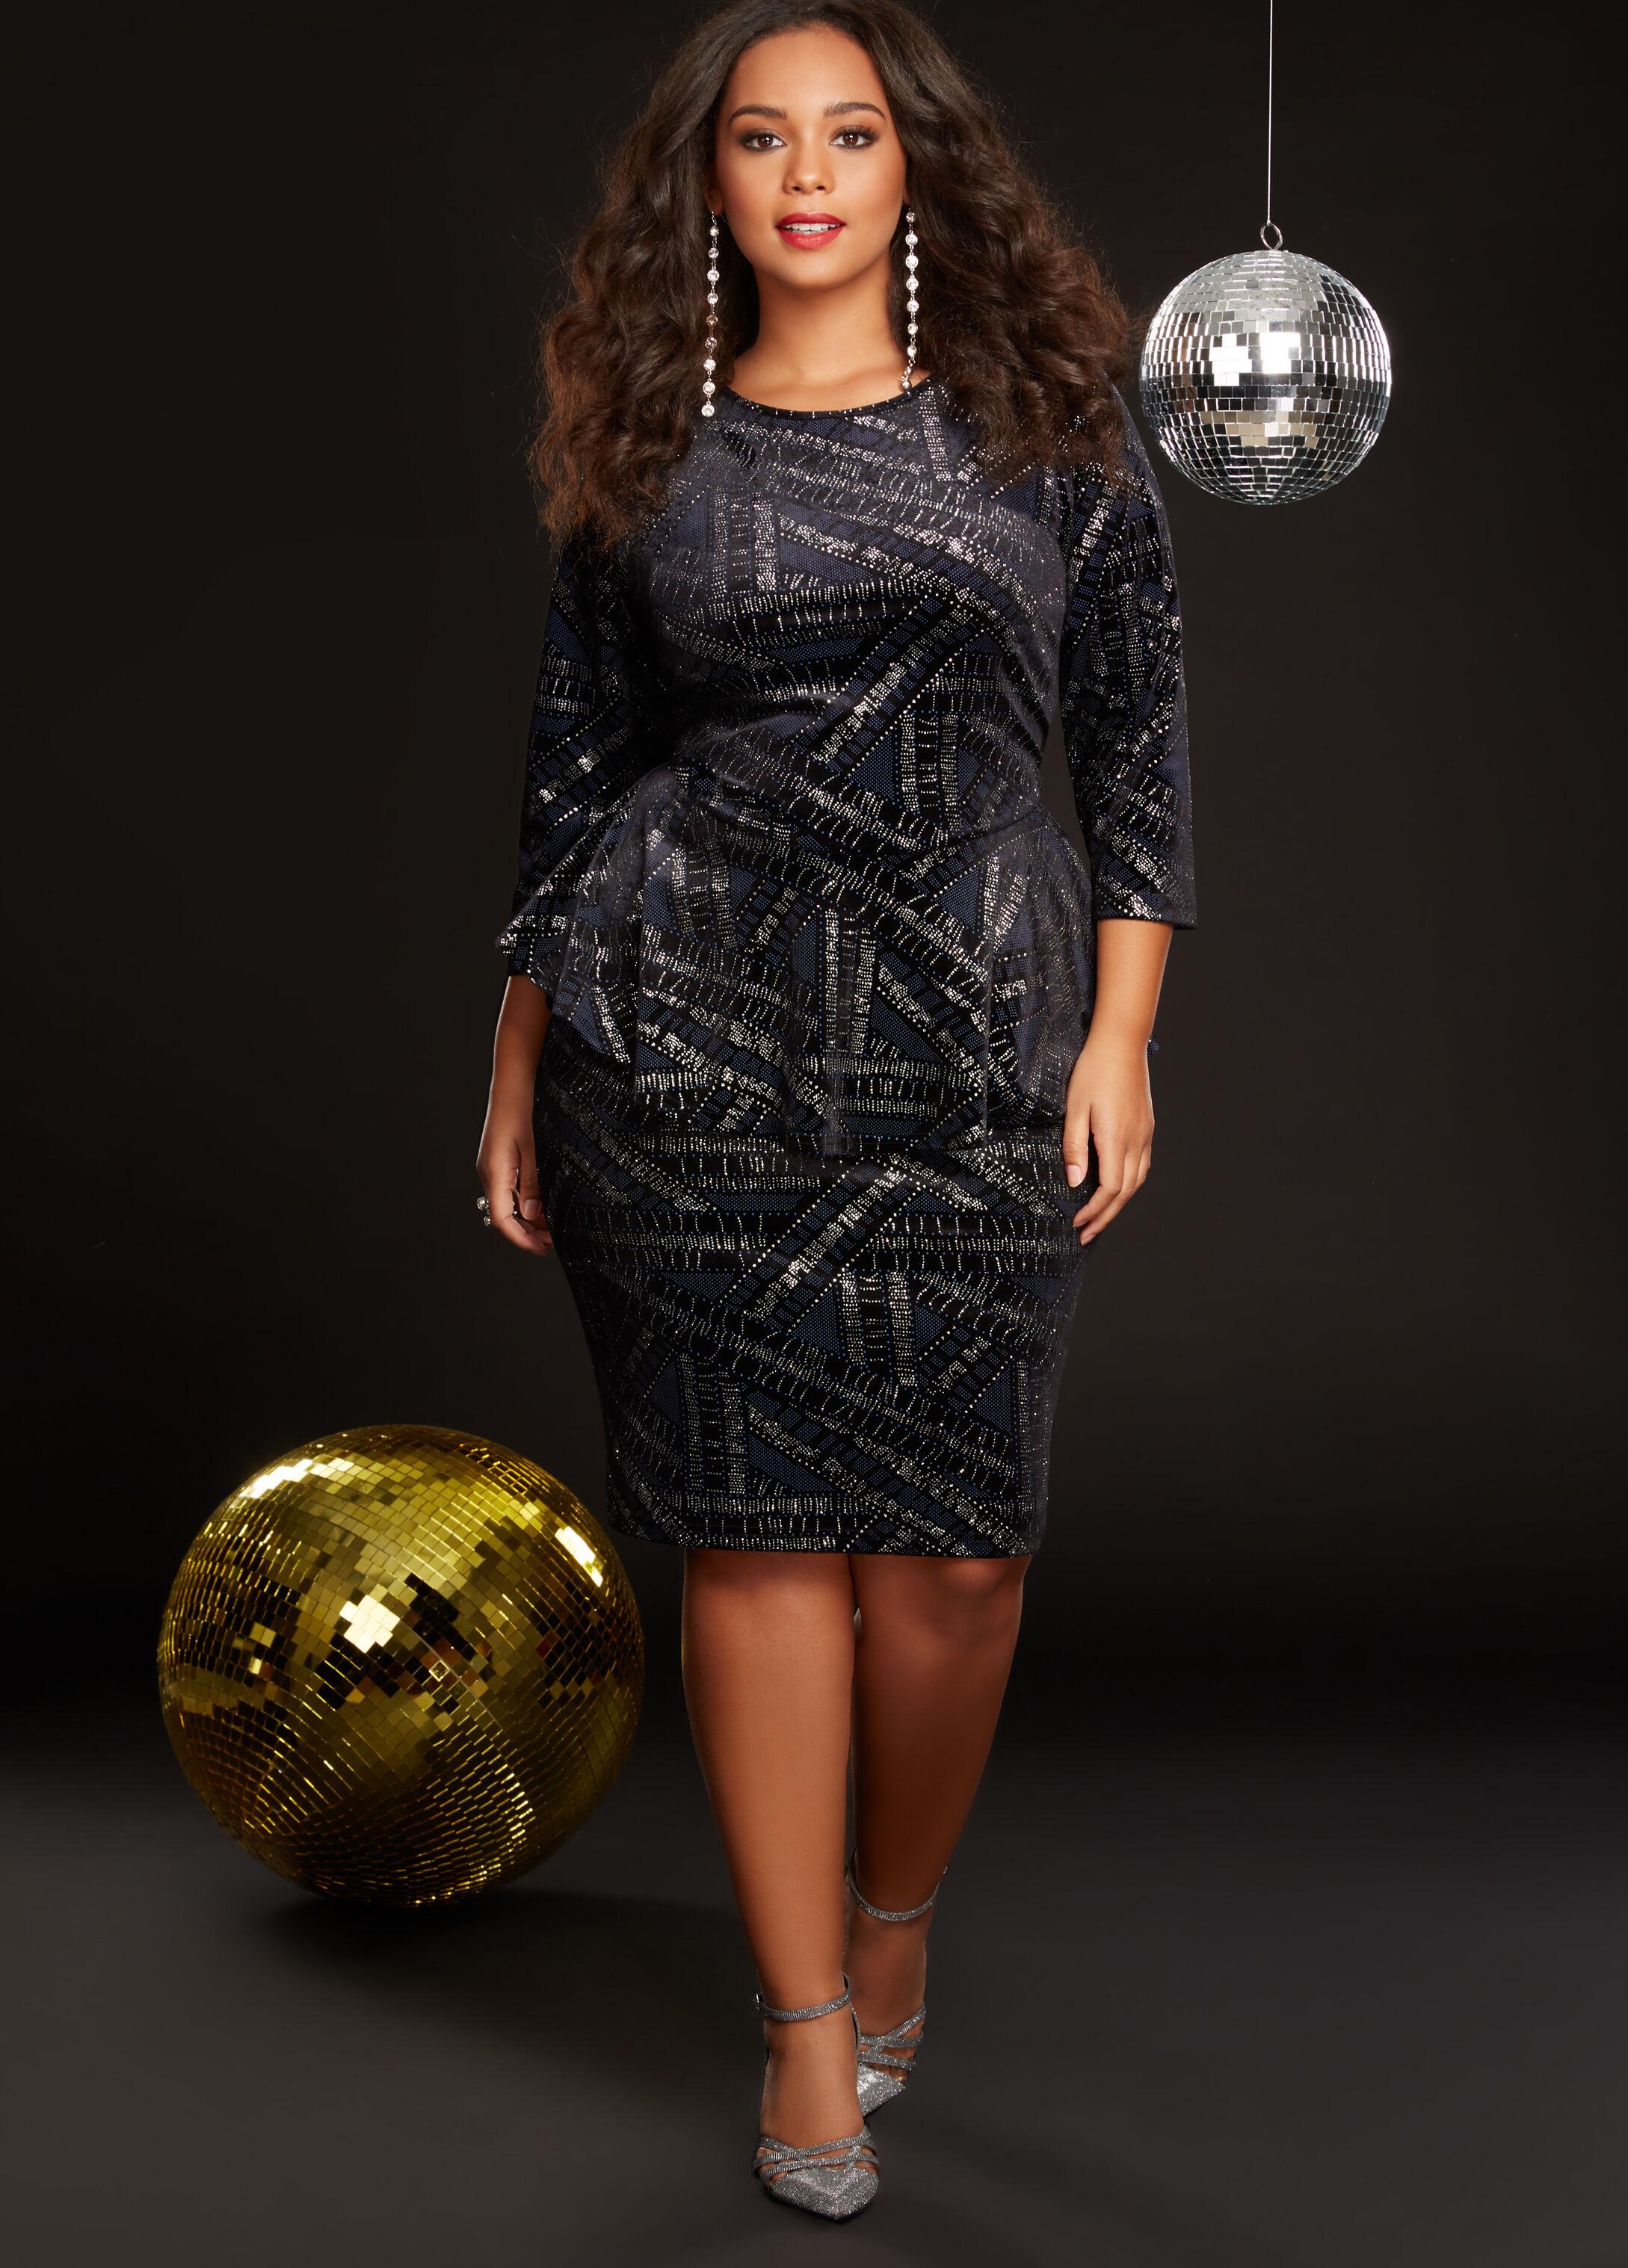 Plus Size Outfits - Velvet Glitter Two Piece Dress Set